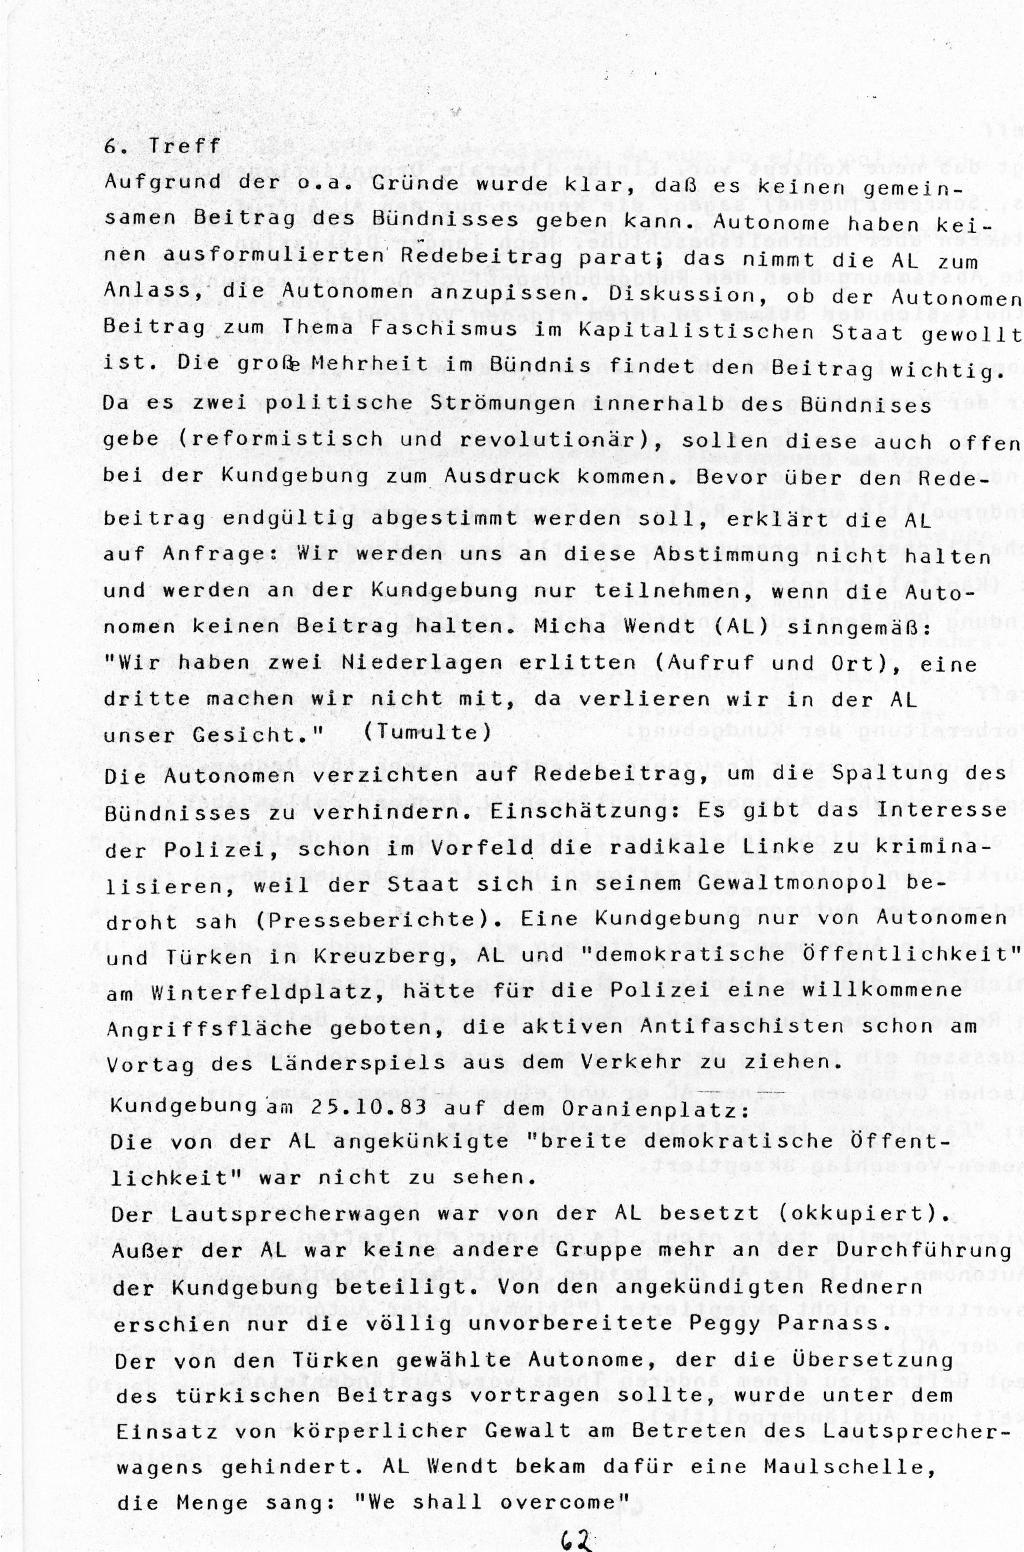 Berlin_1983_Autonome_Gruppen_Faschismus_im_Kapitalismus_62